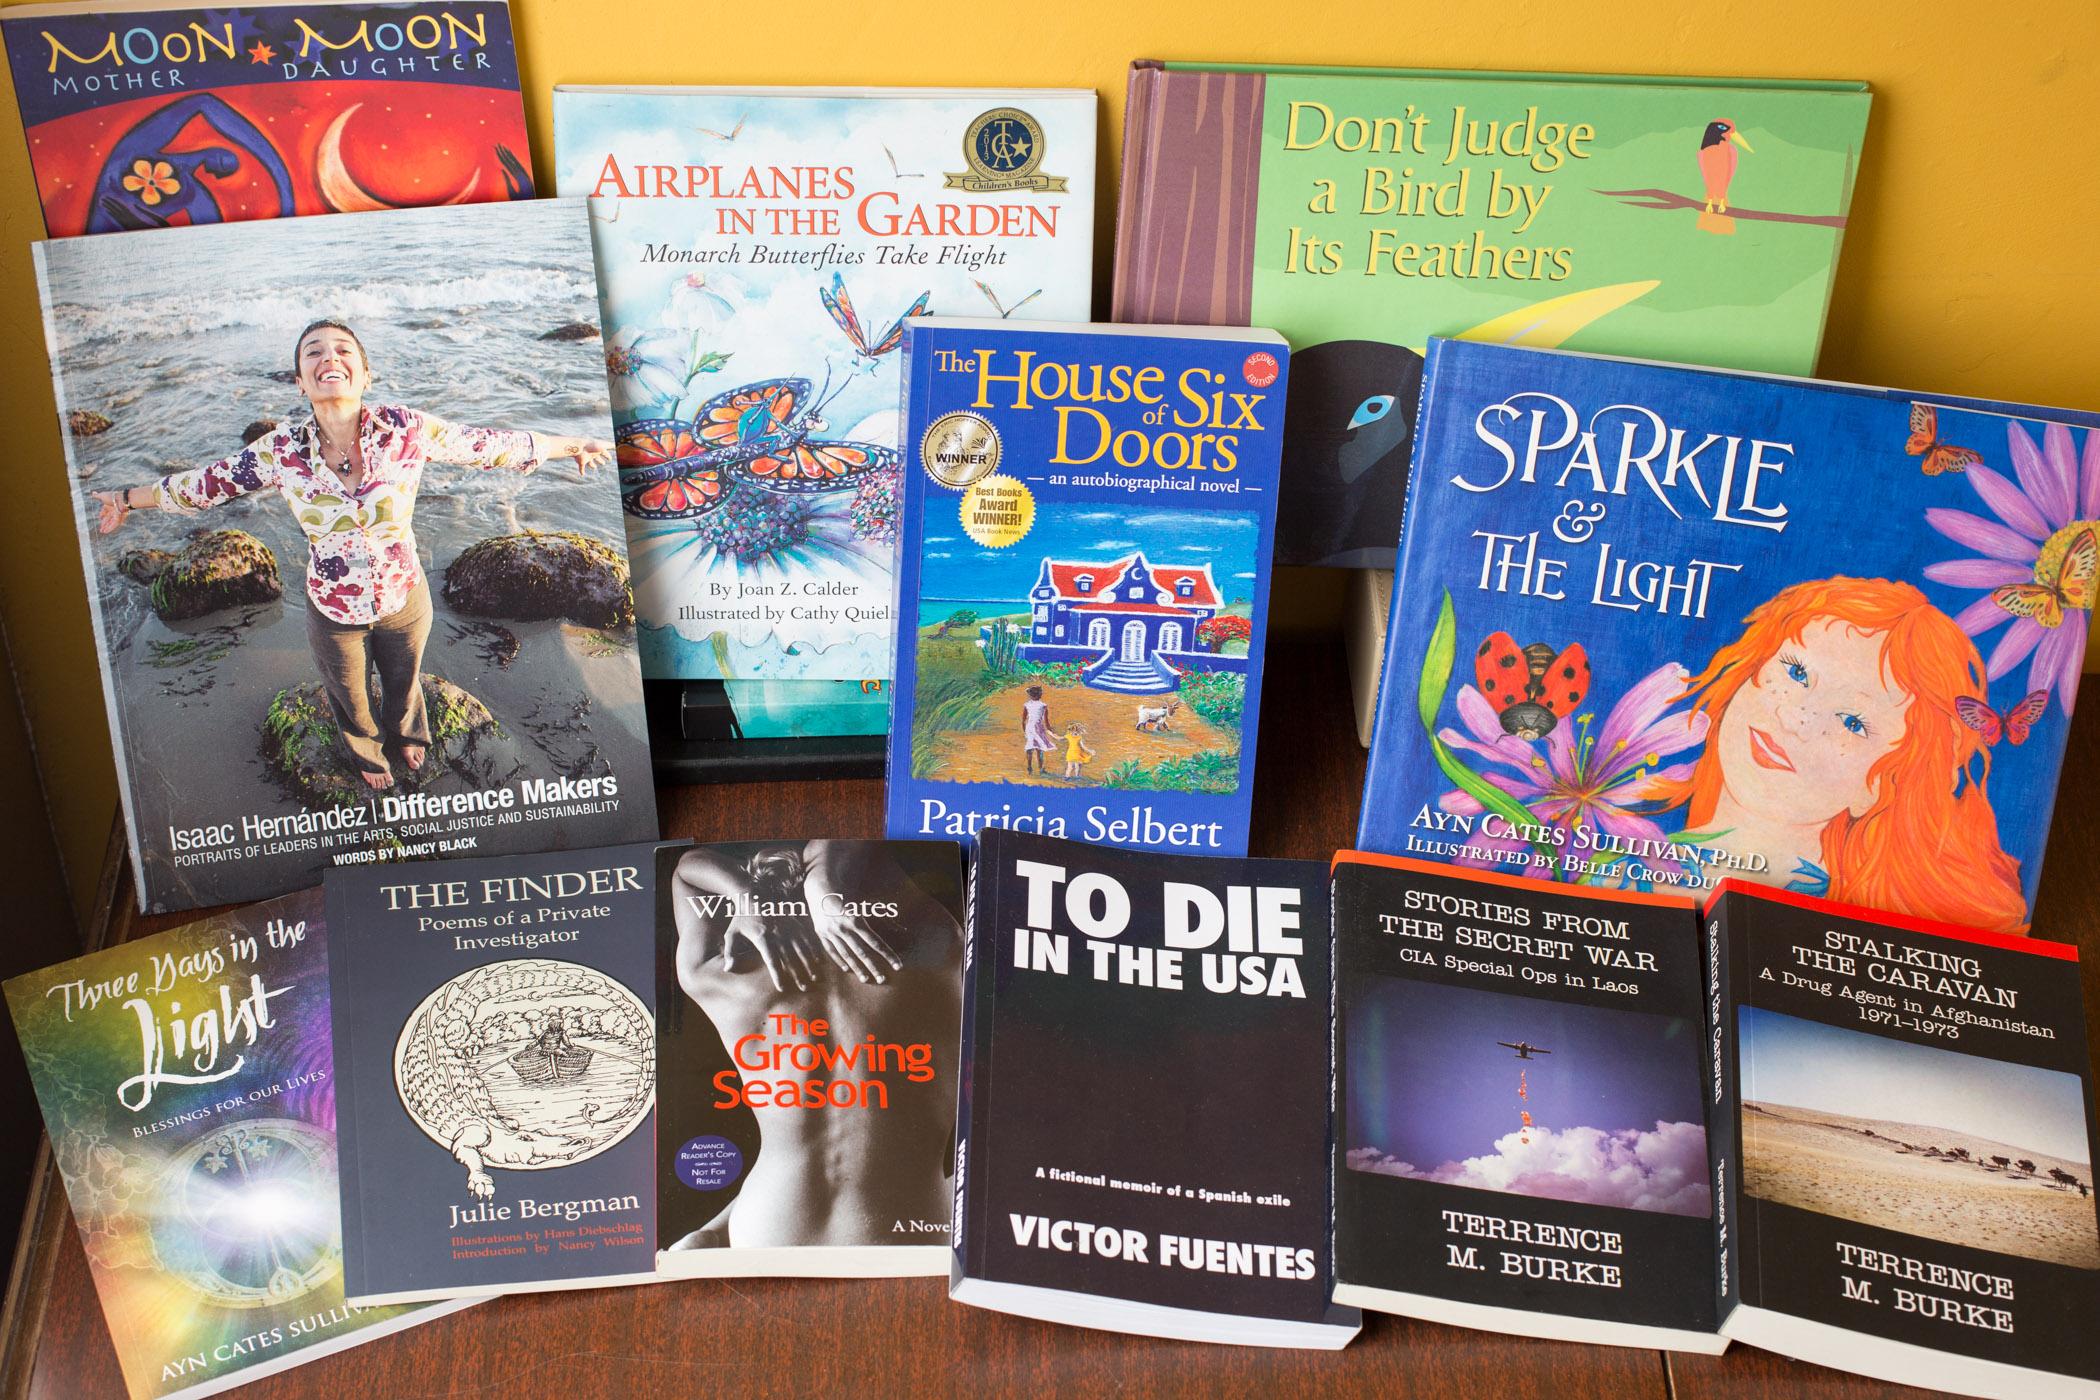 Mercury_Press_books.jpg